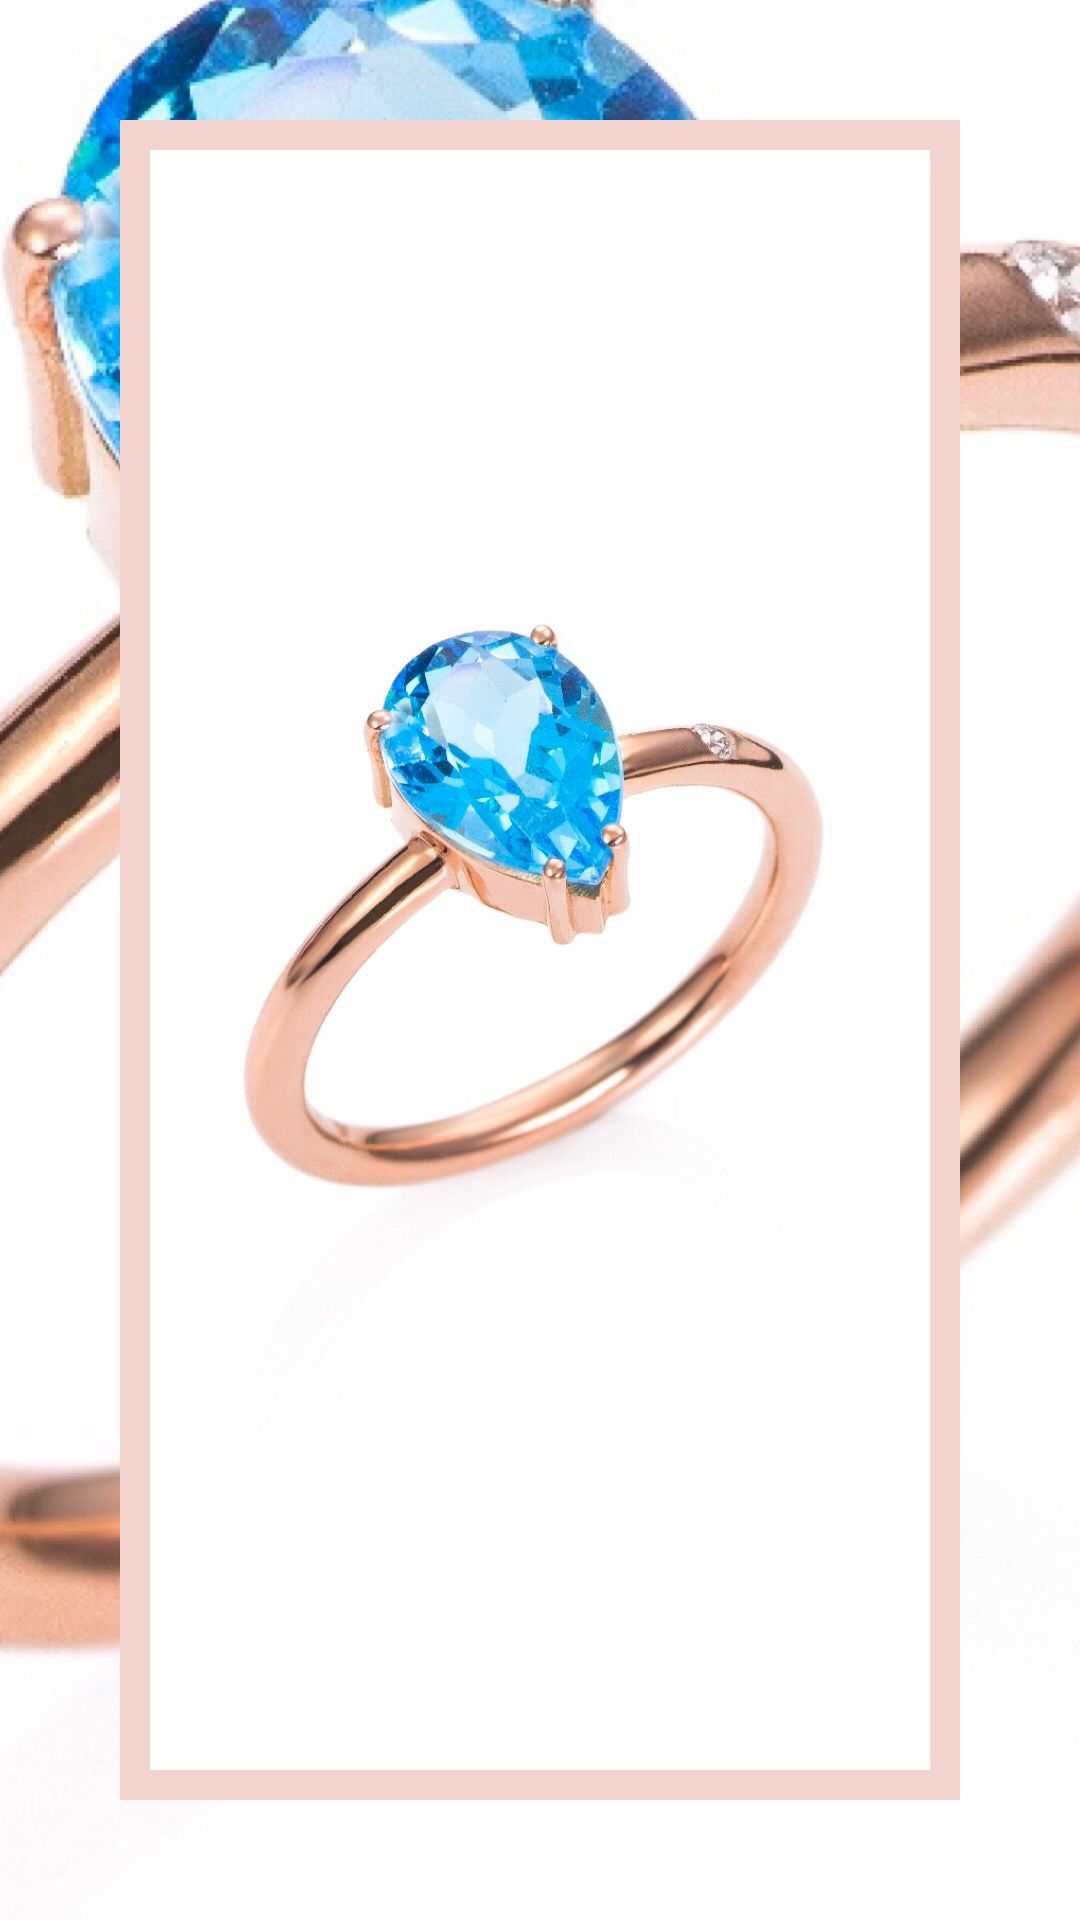 d5e060773497 Anillo elaborado en Oro de 18kts con Topacio sky talla Pera y diamante  talla brillante.